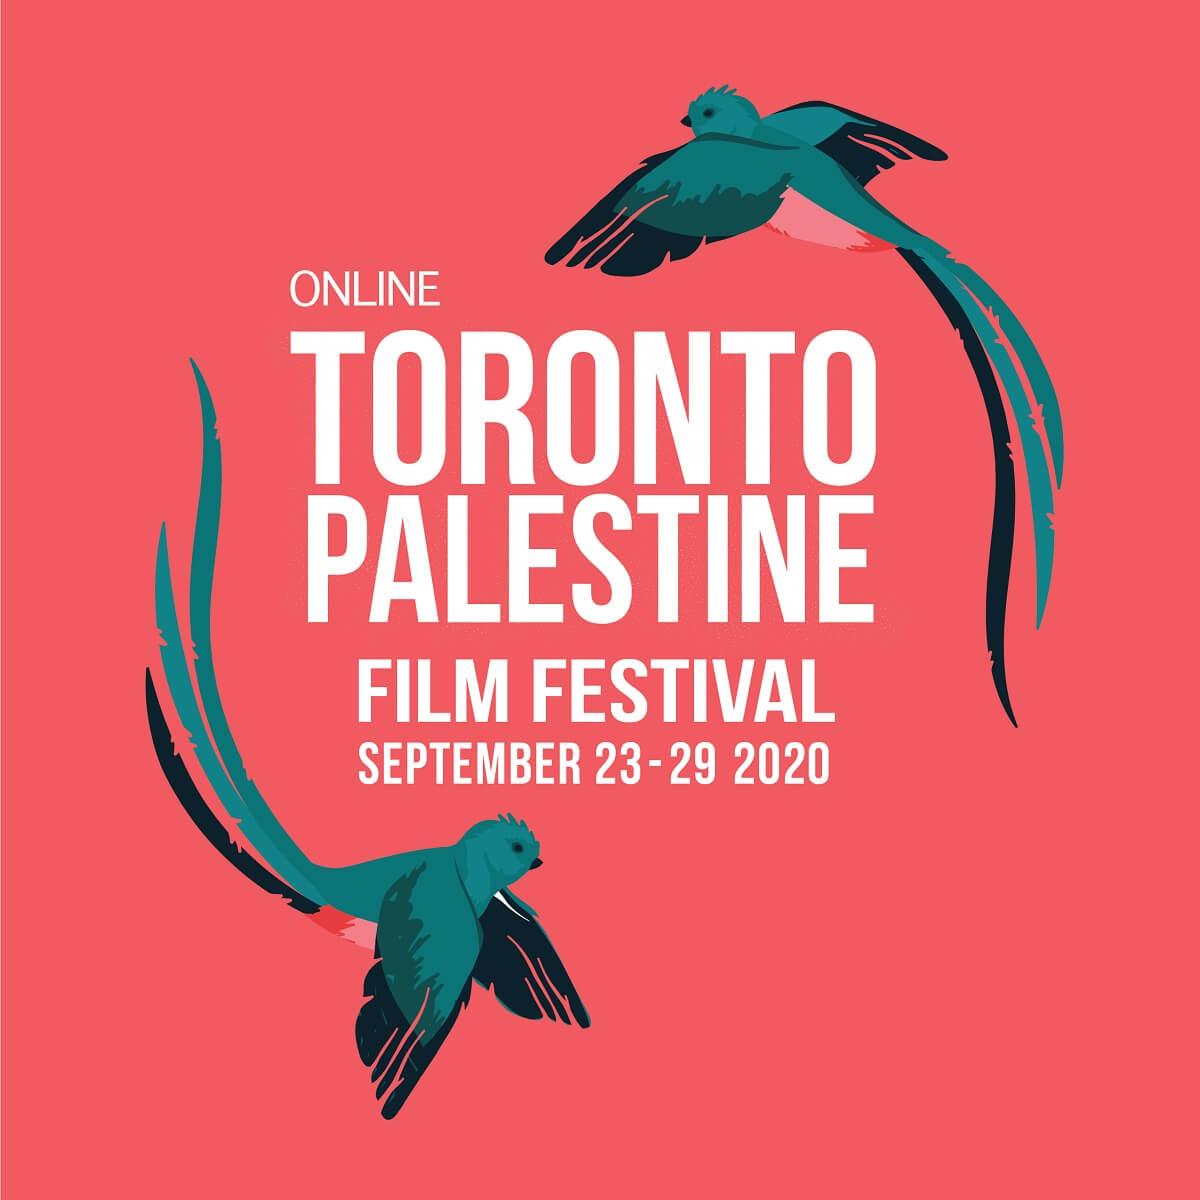 Toronto Palestine Film Festival Shorts Collection: Resisting Borders